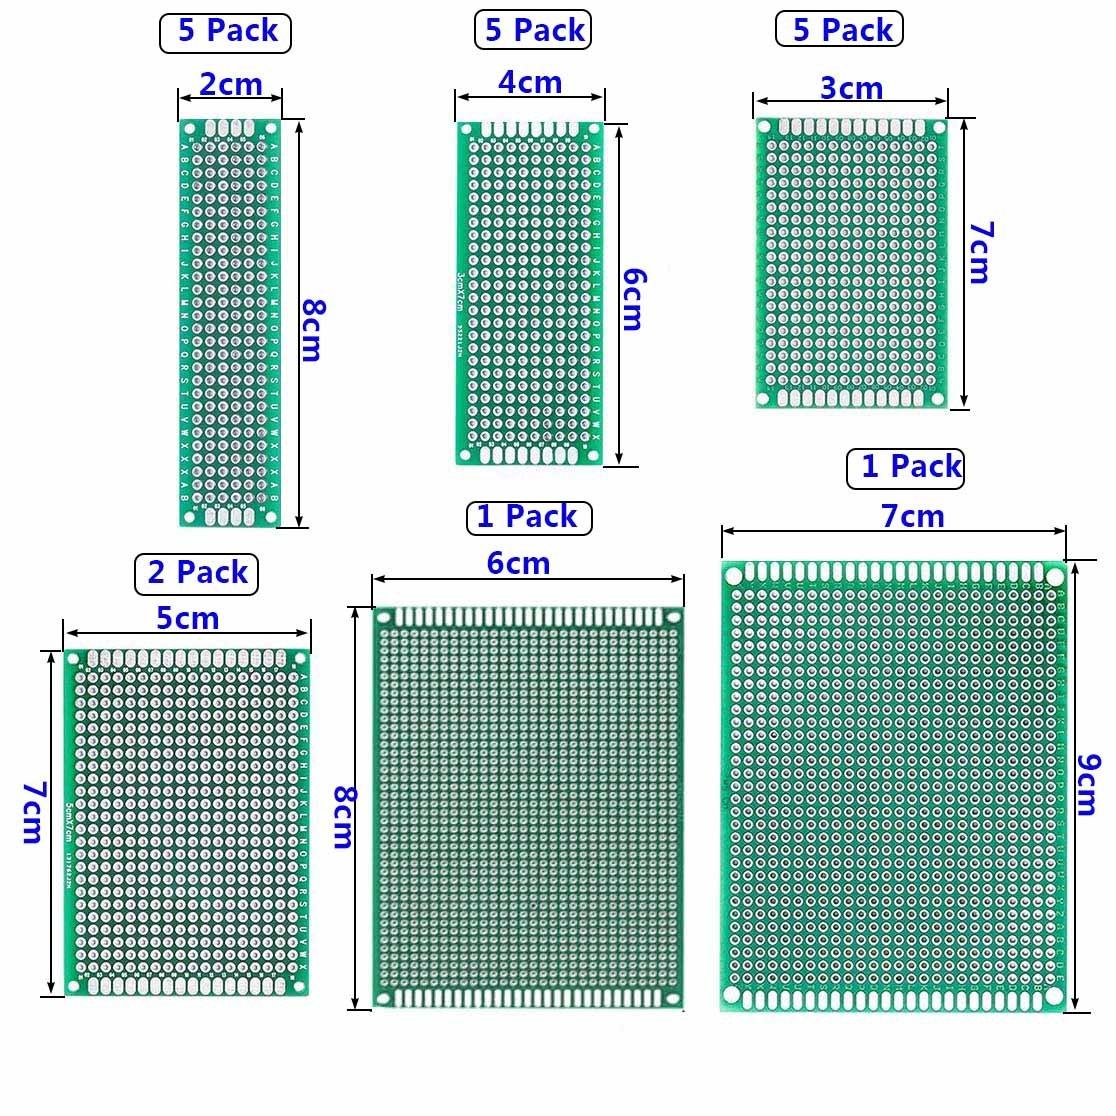 Eiito 19 Pcs Diy Prototype Paper Pcb Universal Experiment Matrix 7cm Circuit Board Double Side Printed Size 6